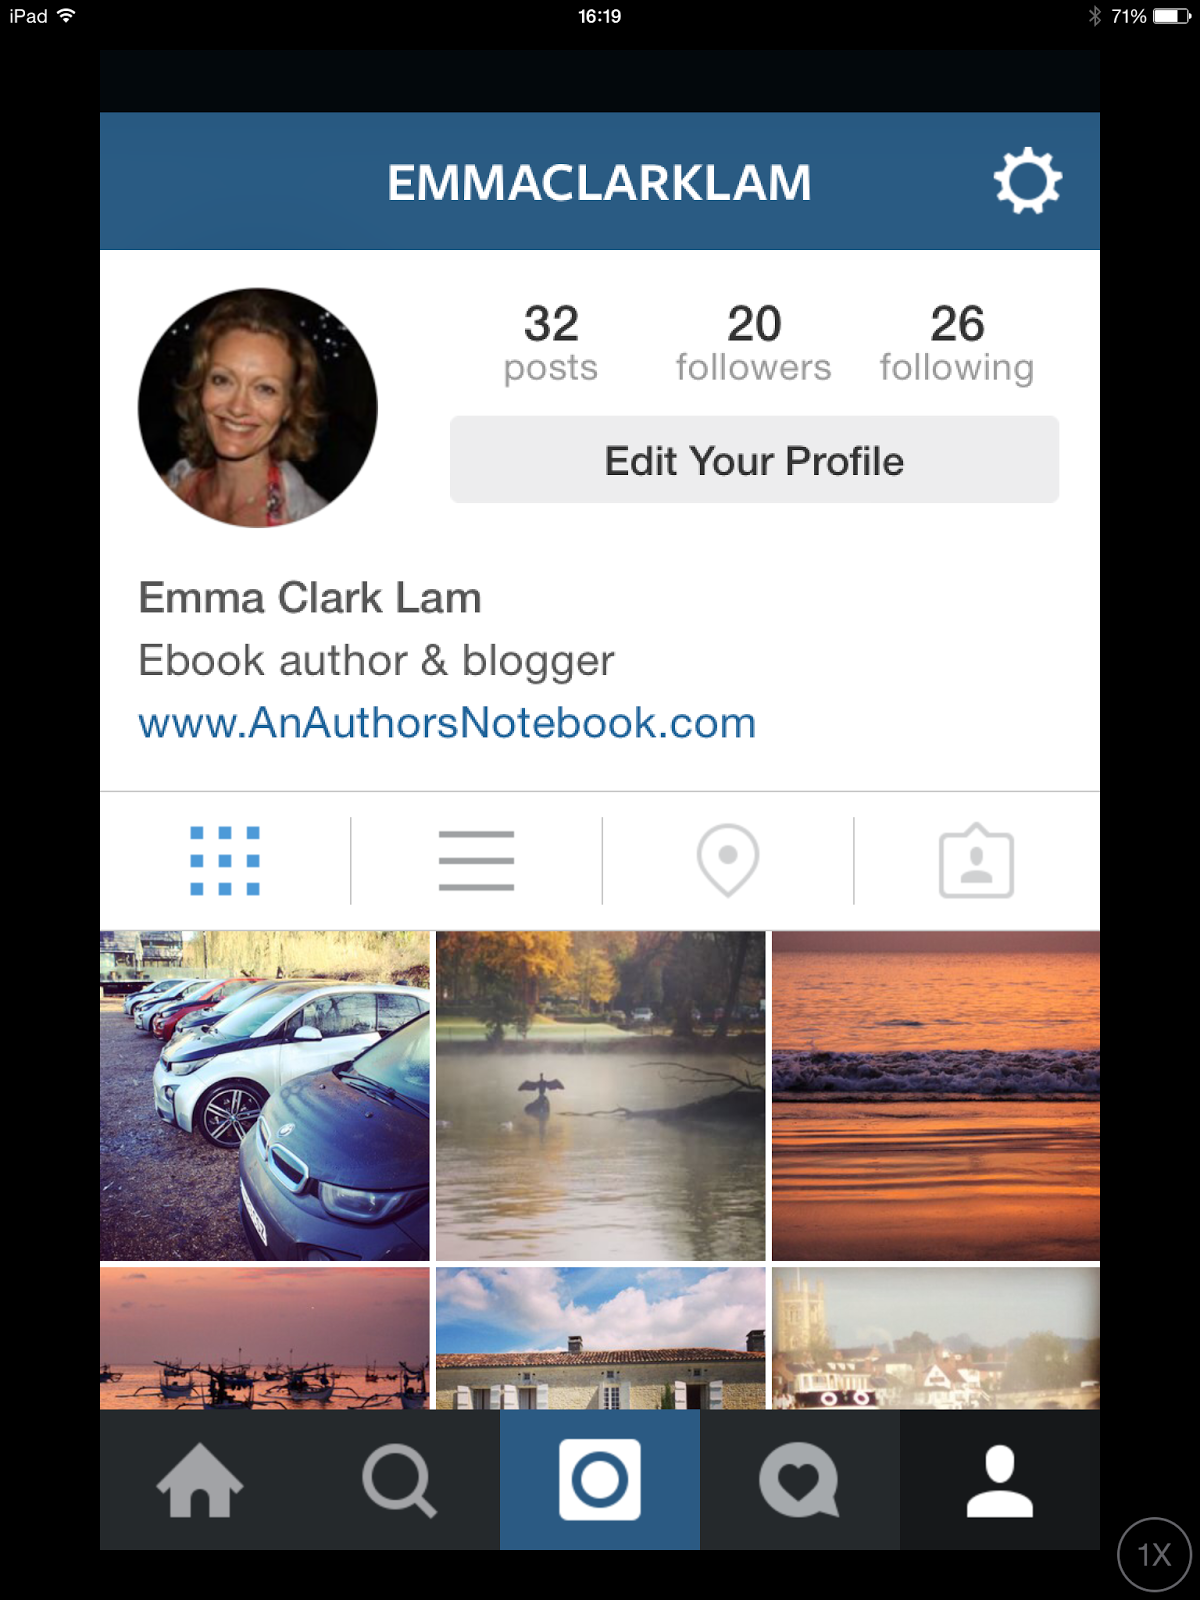 Photo grab of Instagram profile